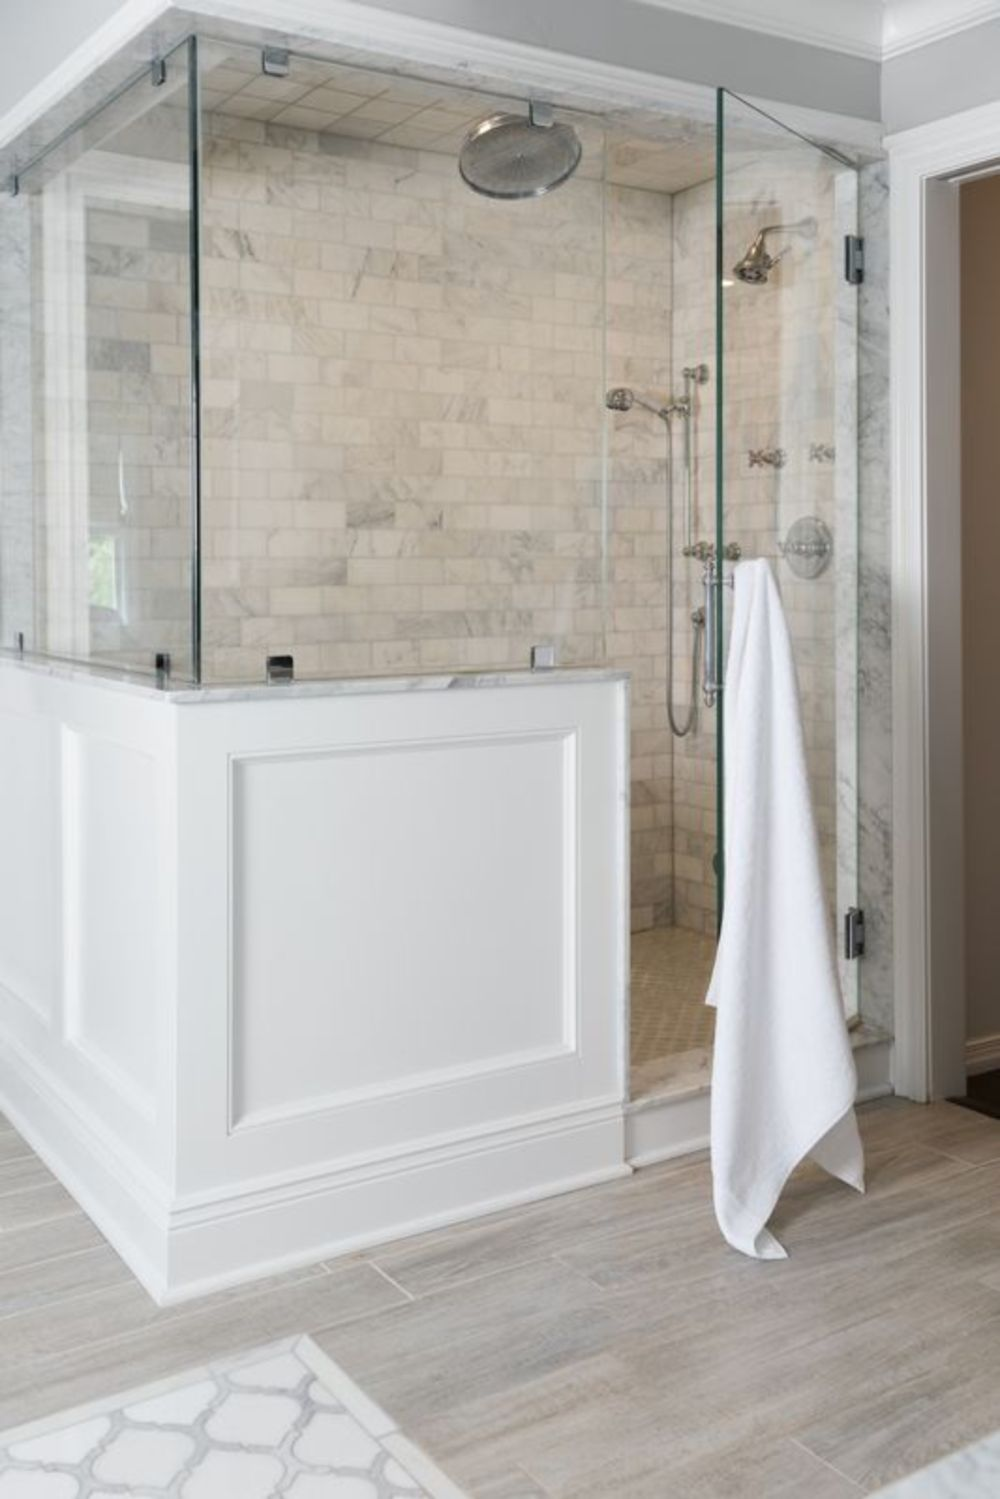 50 Cozy Bathroom Tile Design Ideas | Tile design, Nice and Cozy bathroom